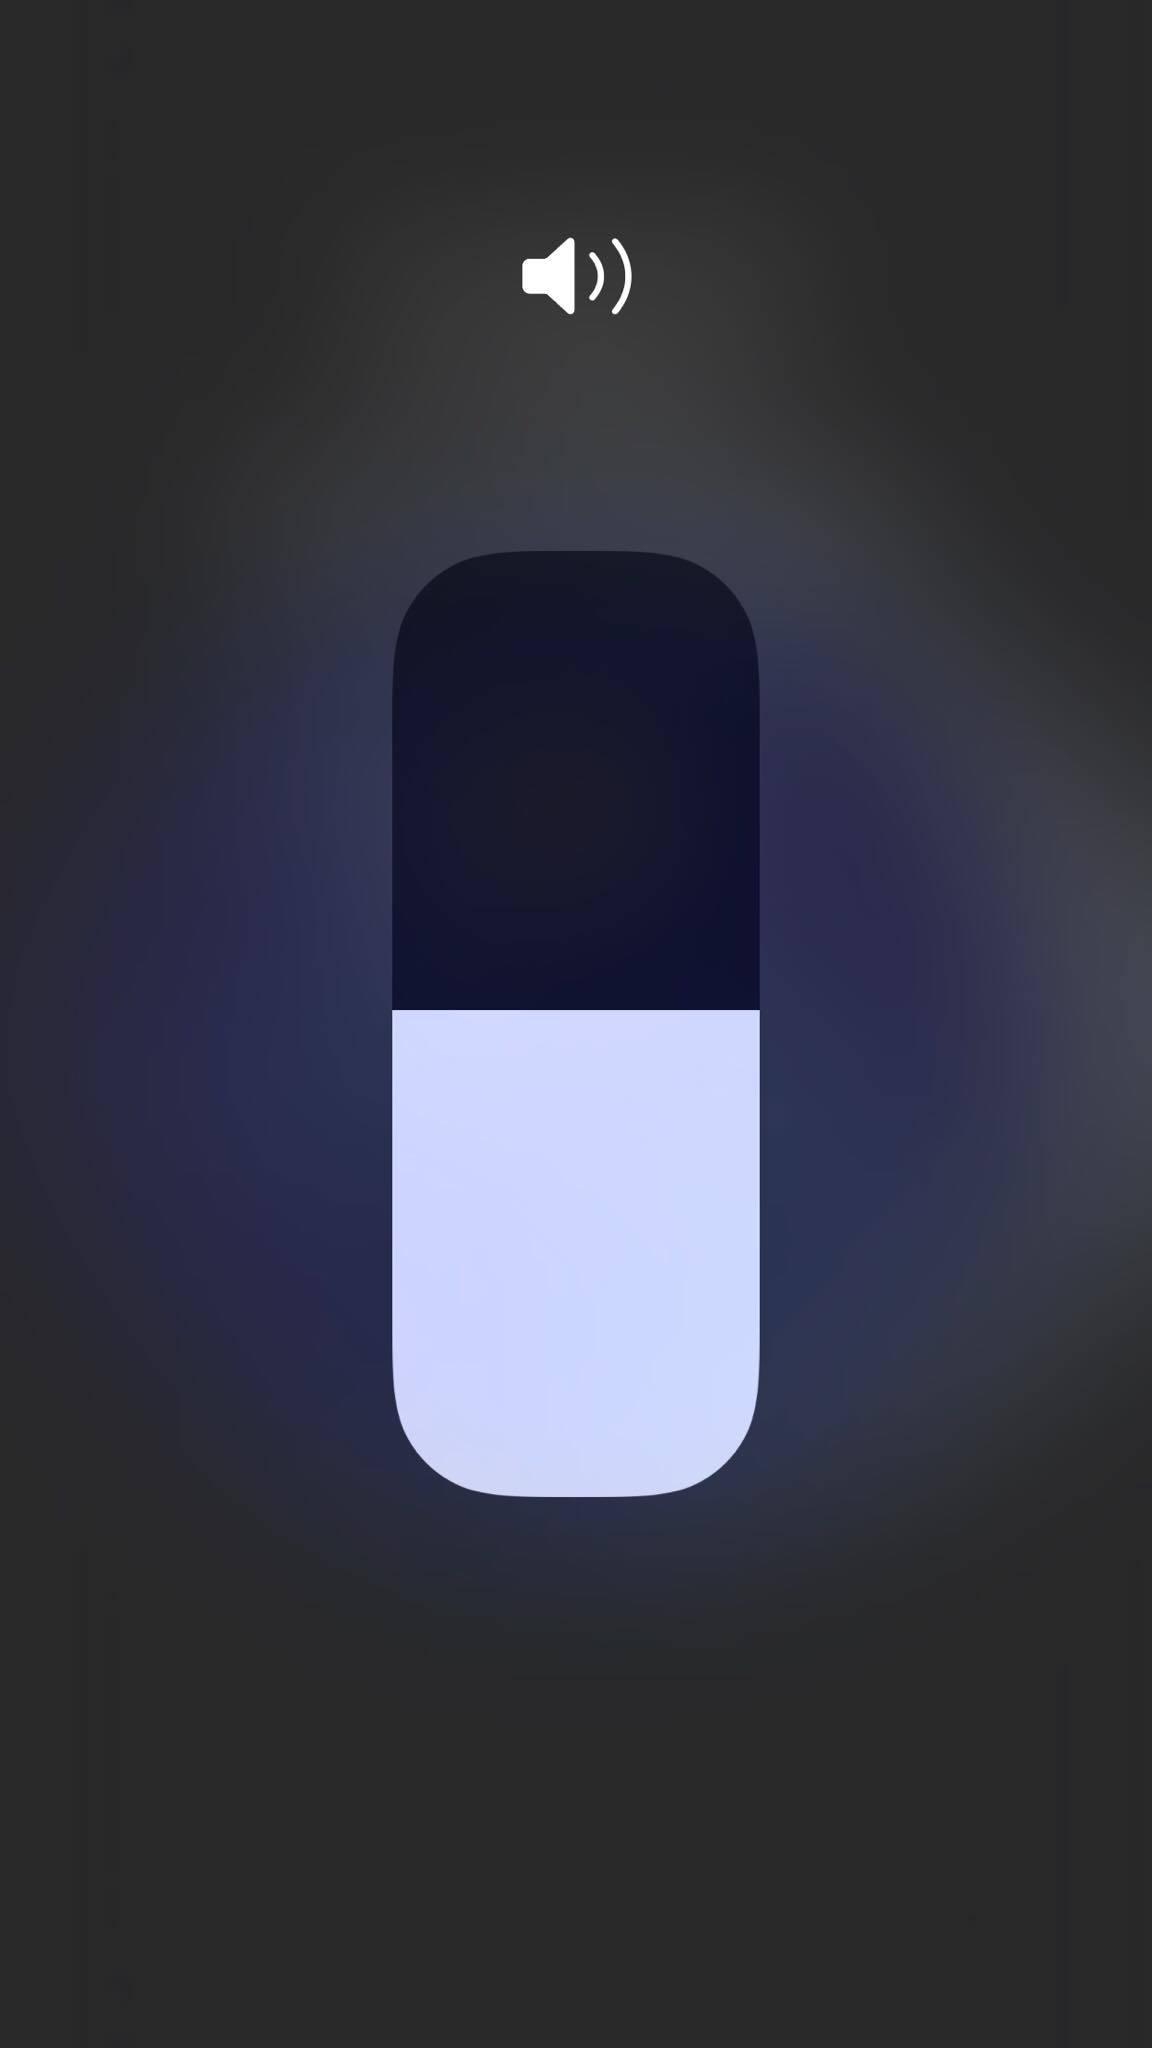 Sound control of iOS 11